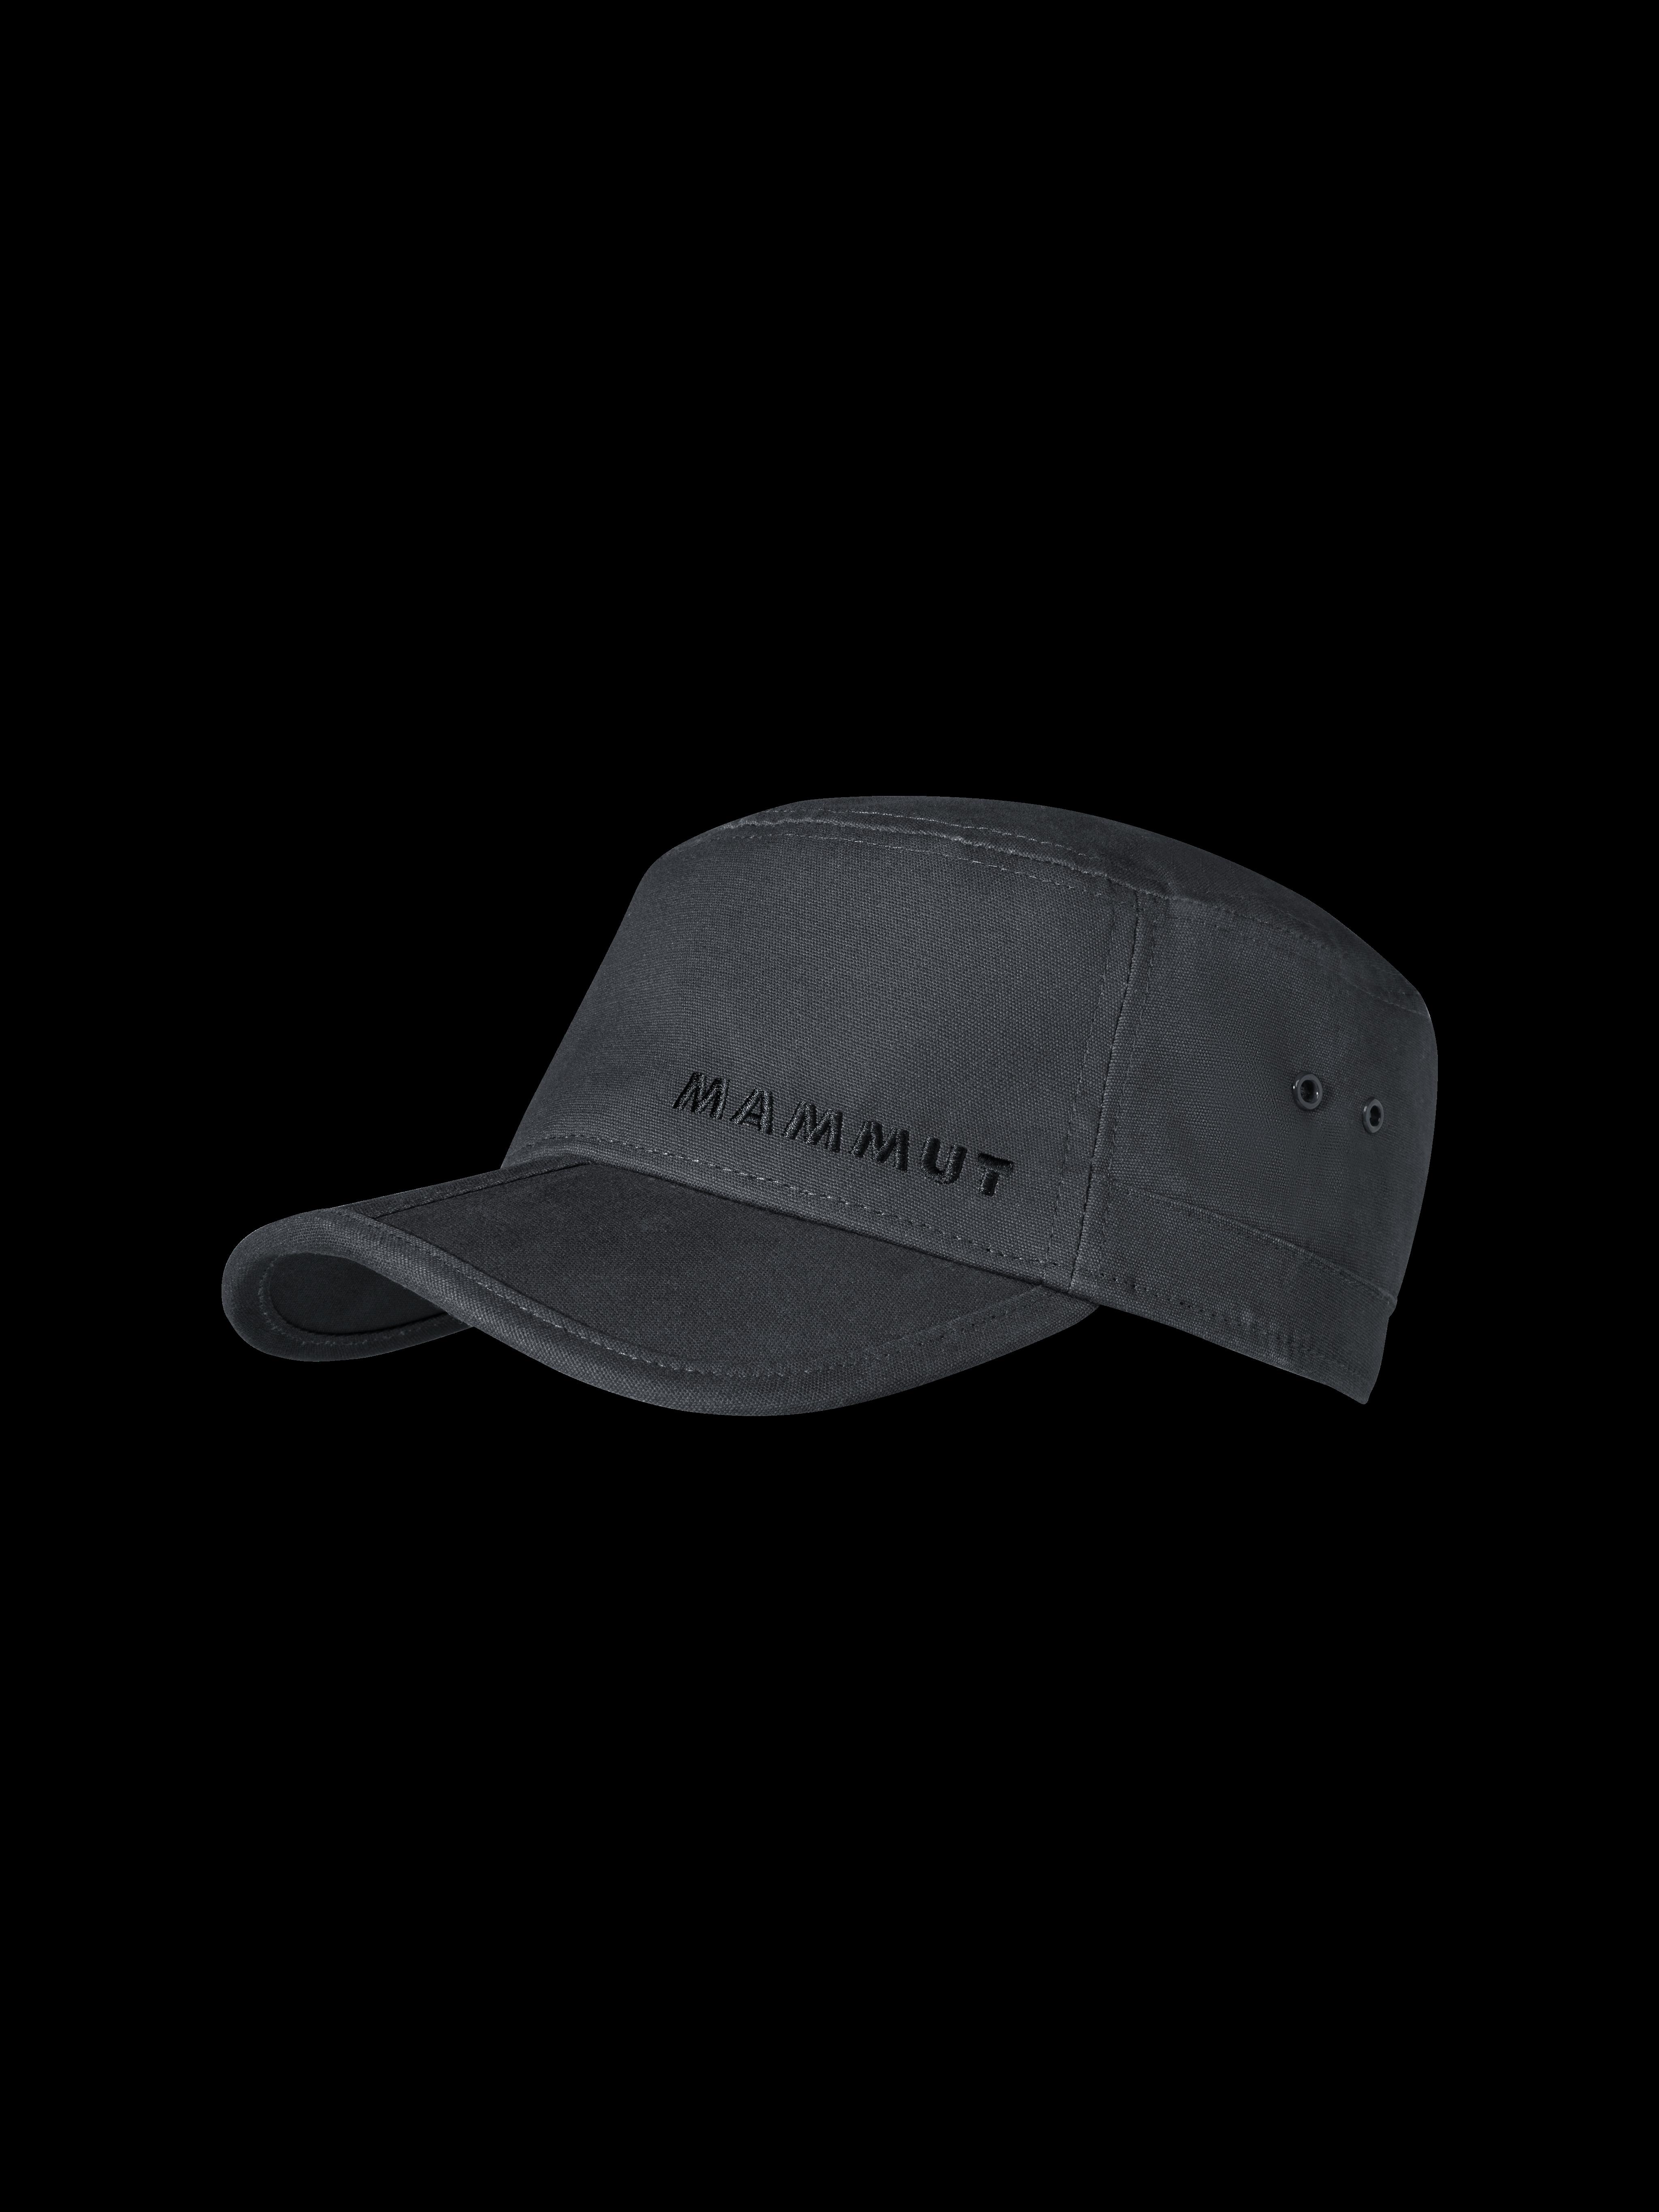 Lhasa Cap product image